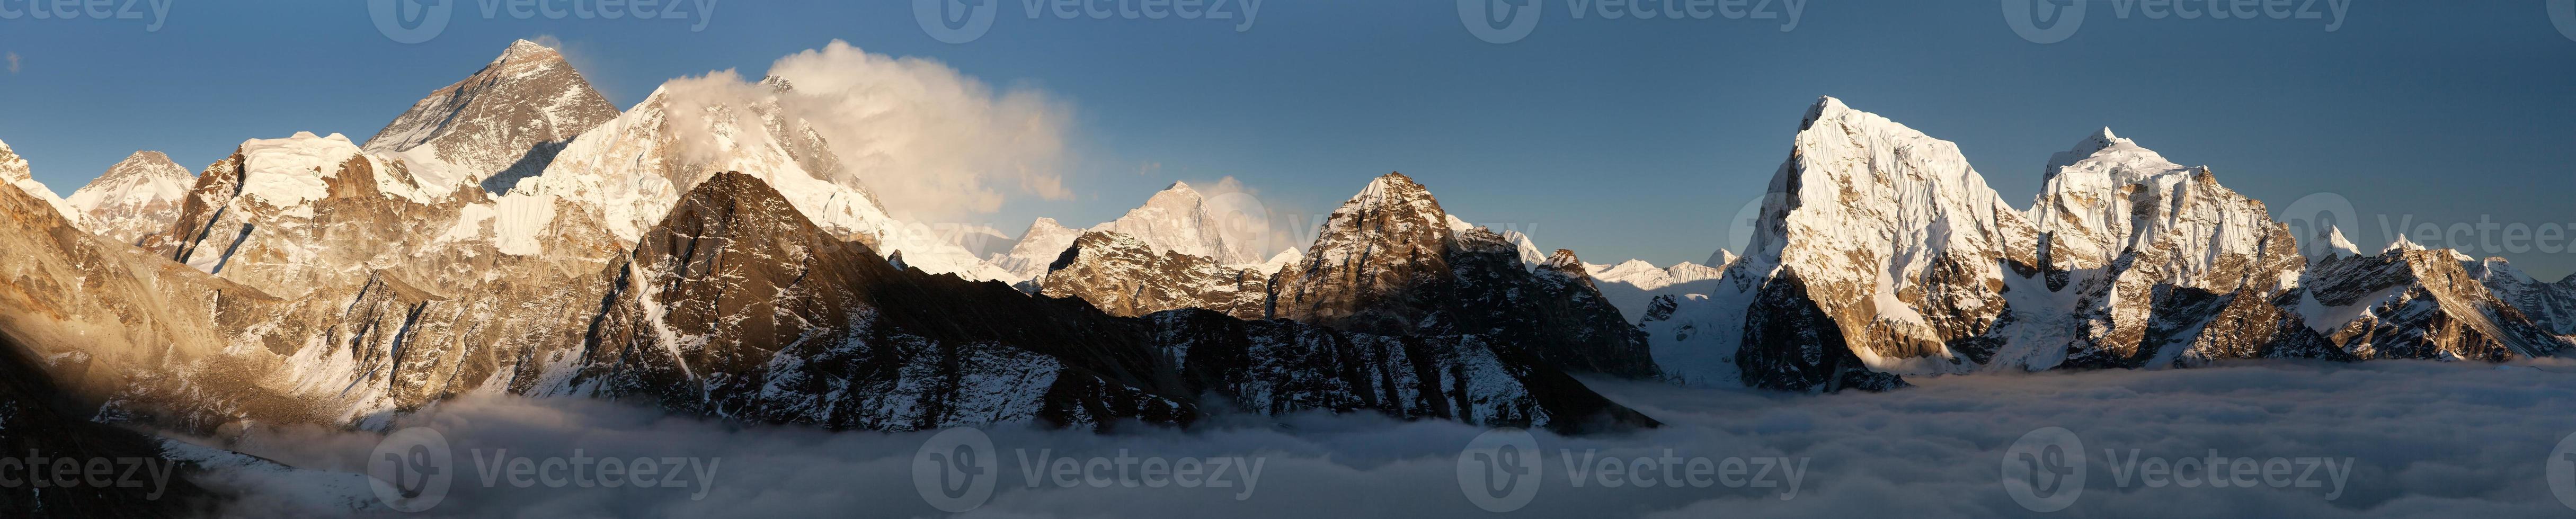 vista do monte everest, lhotse e makalu de gokyo ri foto